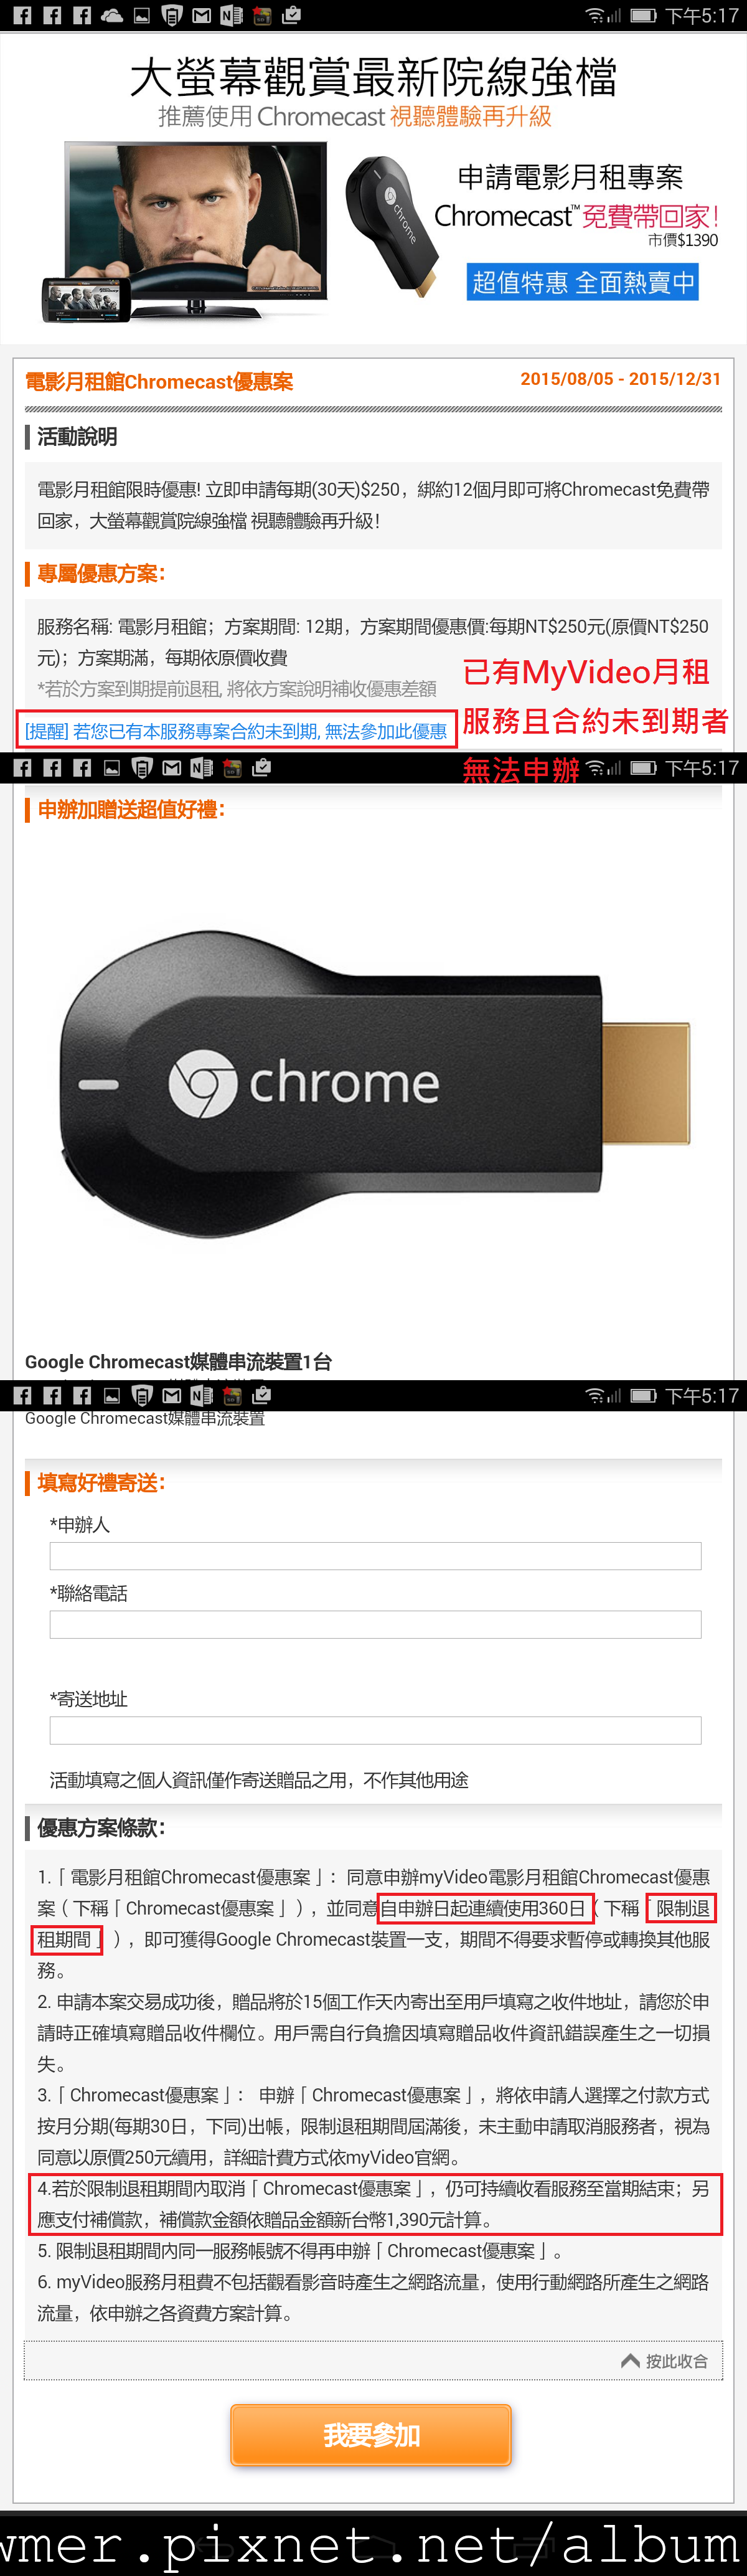 Chromecast優惠方案.png